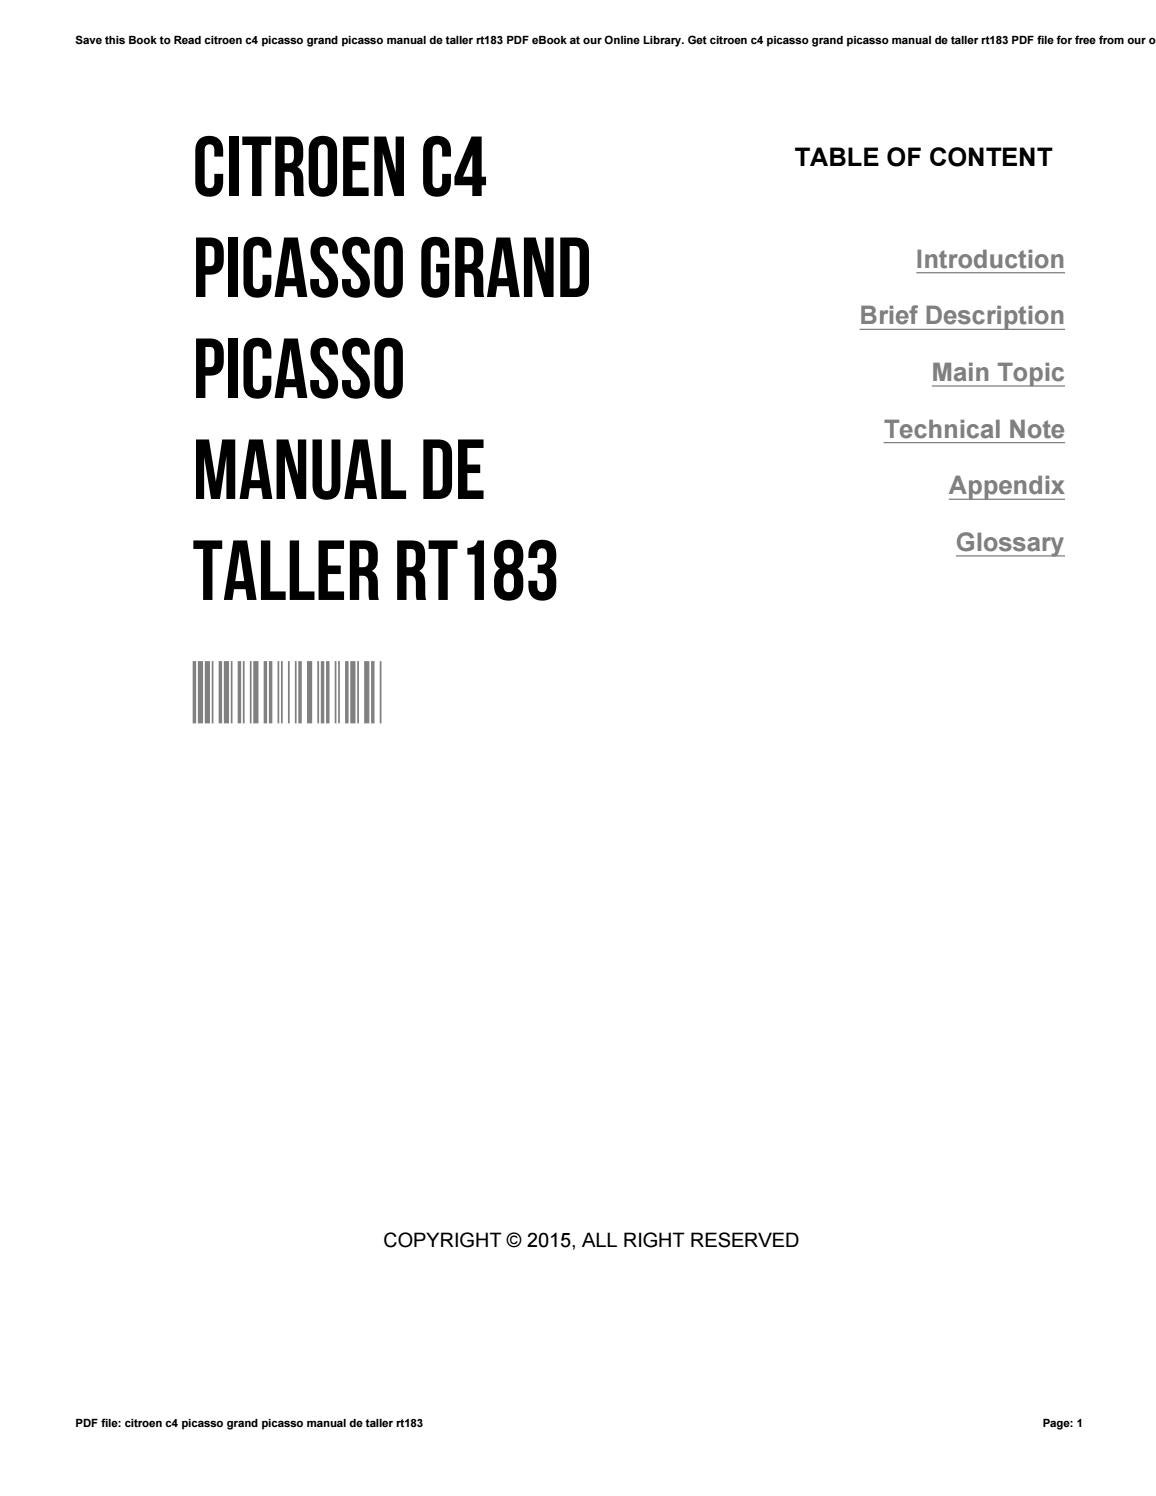 Citroen c4 picasso grand picasso manual de taller rt183 by